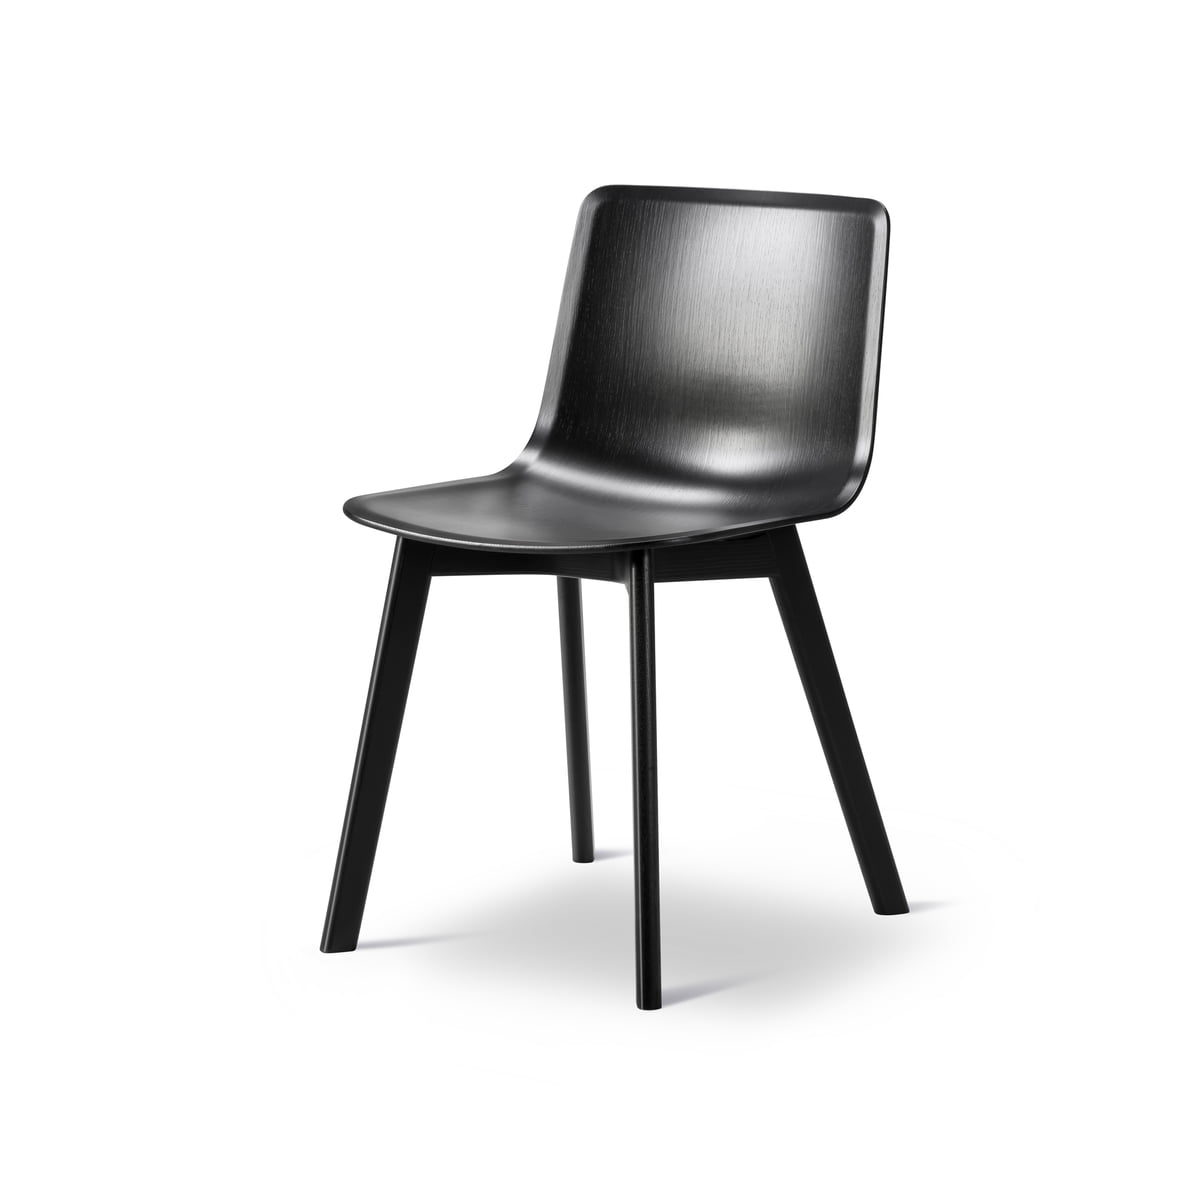 Pato stuhl furnier holz von fredericia for Stuhl schwarz holz